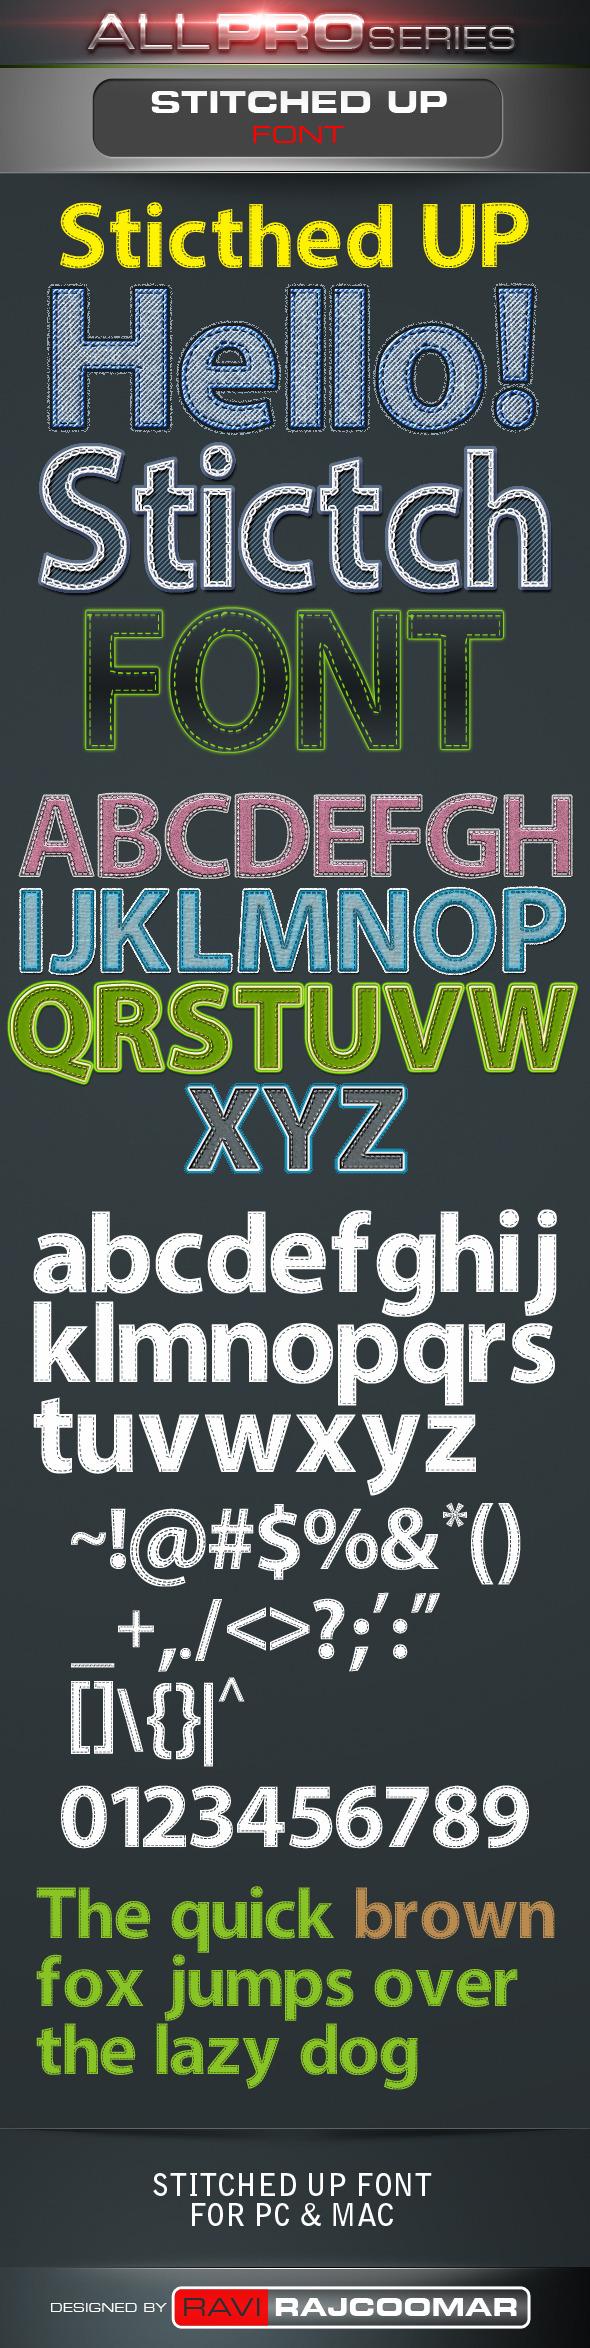 Stitched UP Font - Sans-Serif Fonts